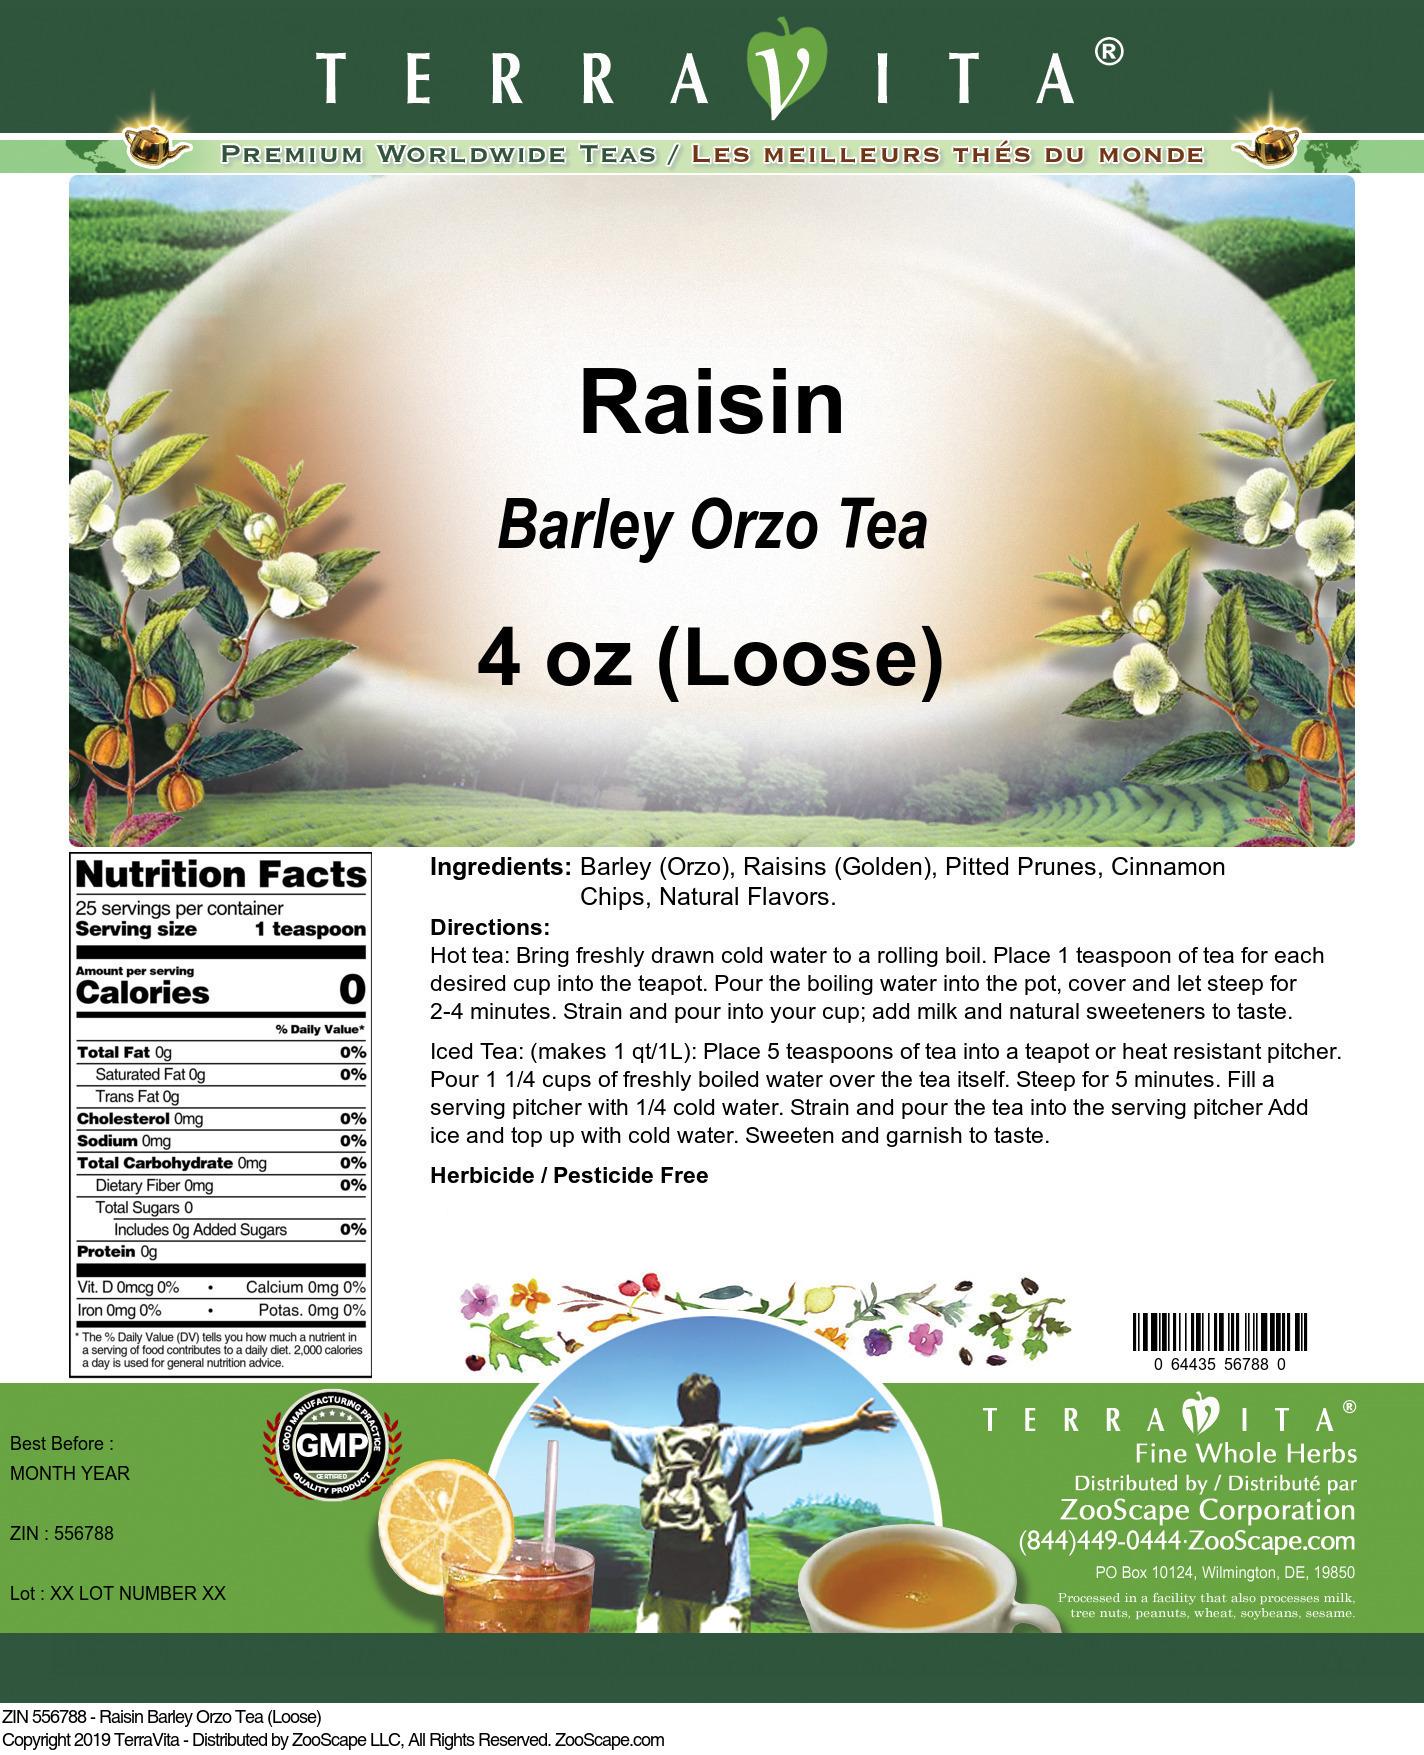 Raisin Barley Orzo